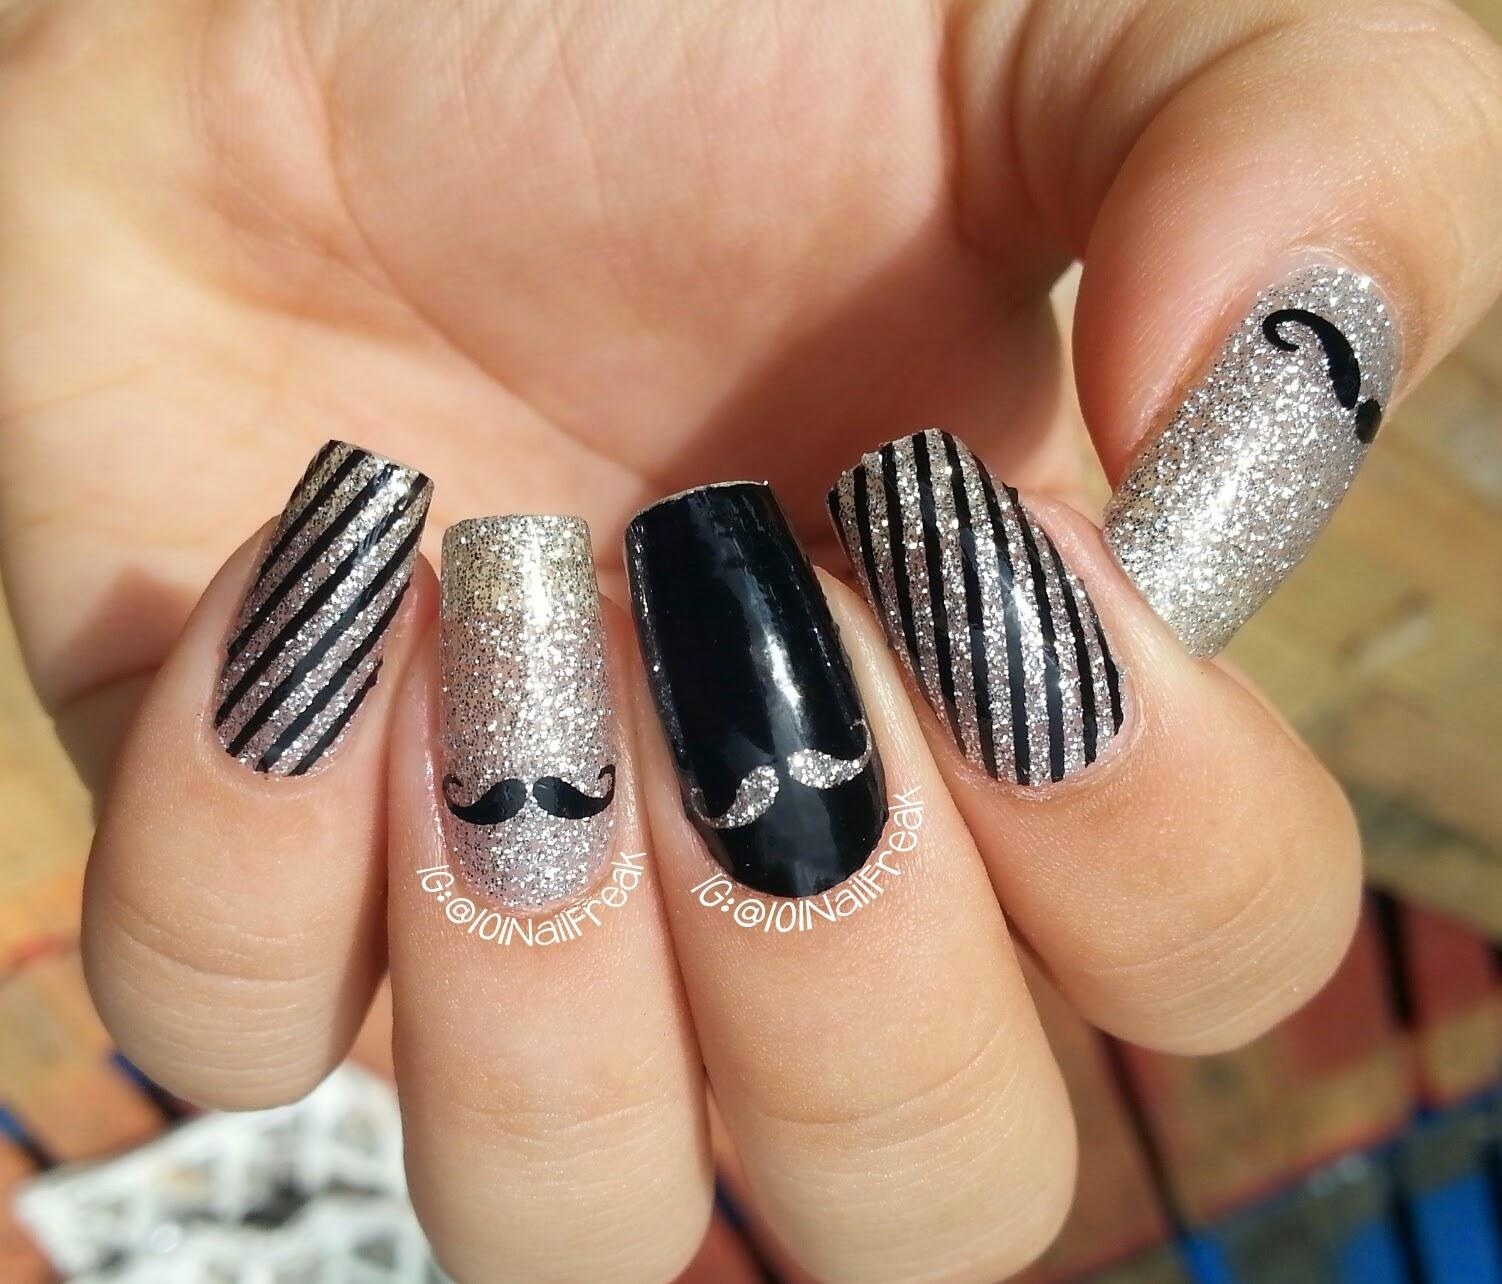 Selenas Nail Art Winstonia Designer Nail Wraps Review